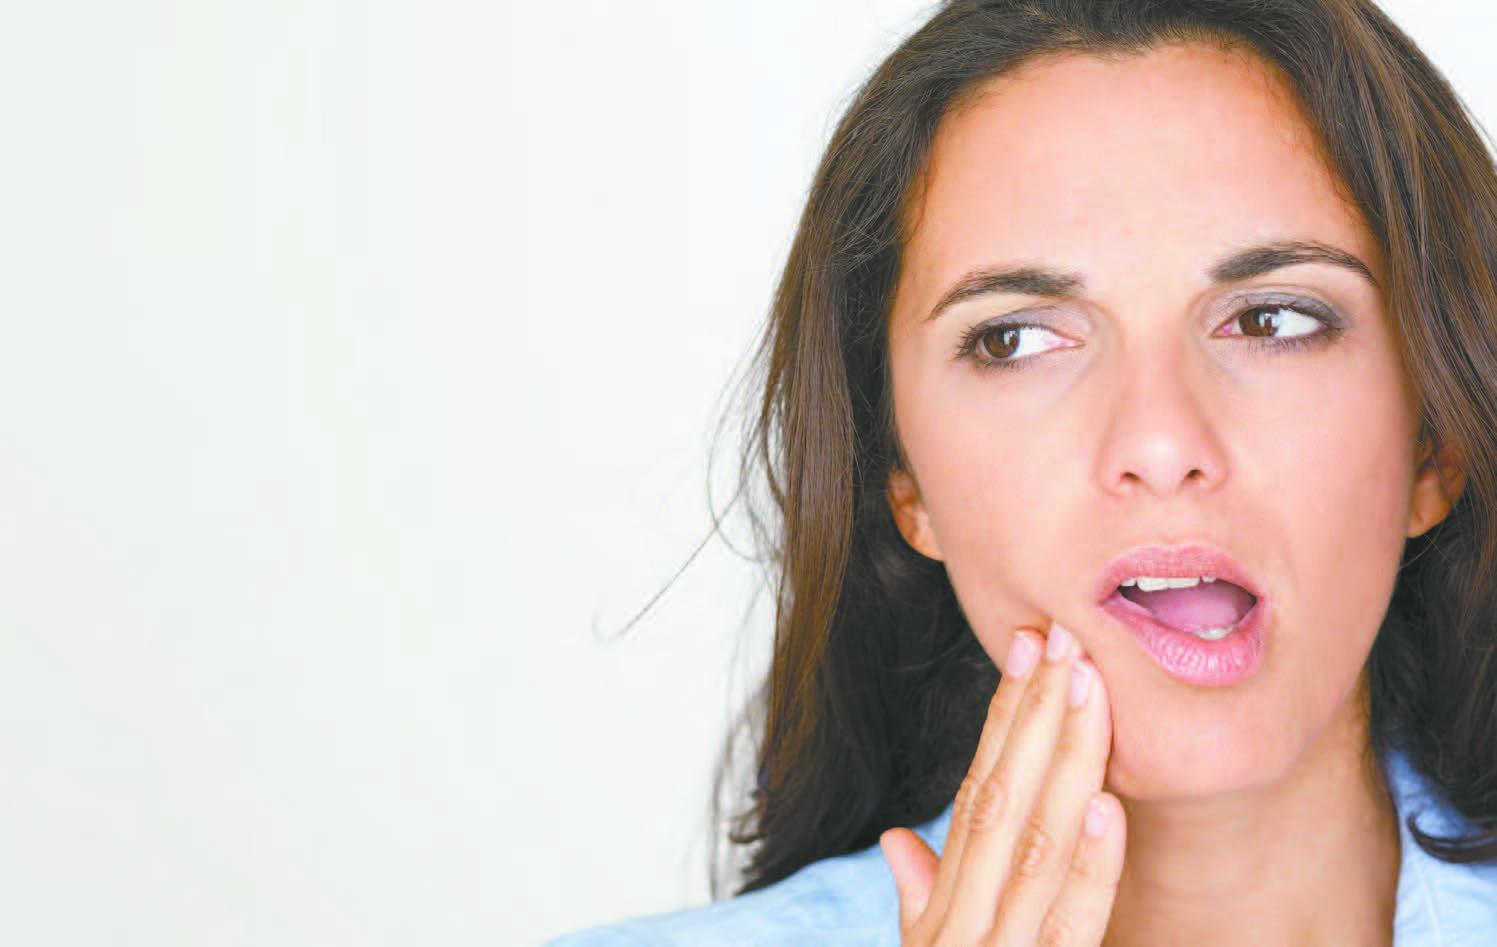 Do you have sensitive teeth?